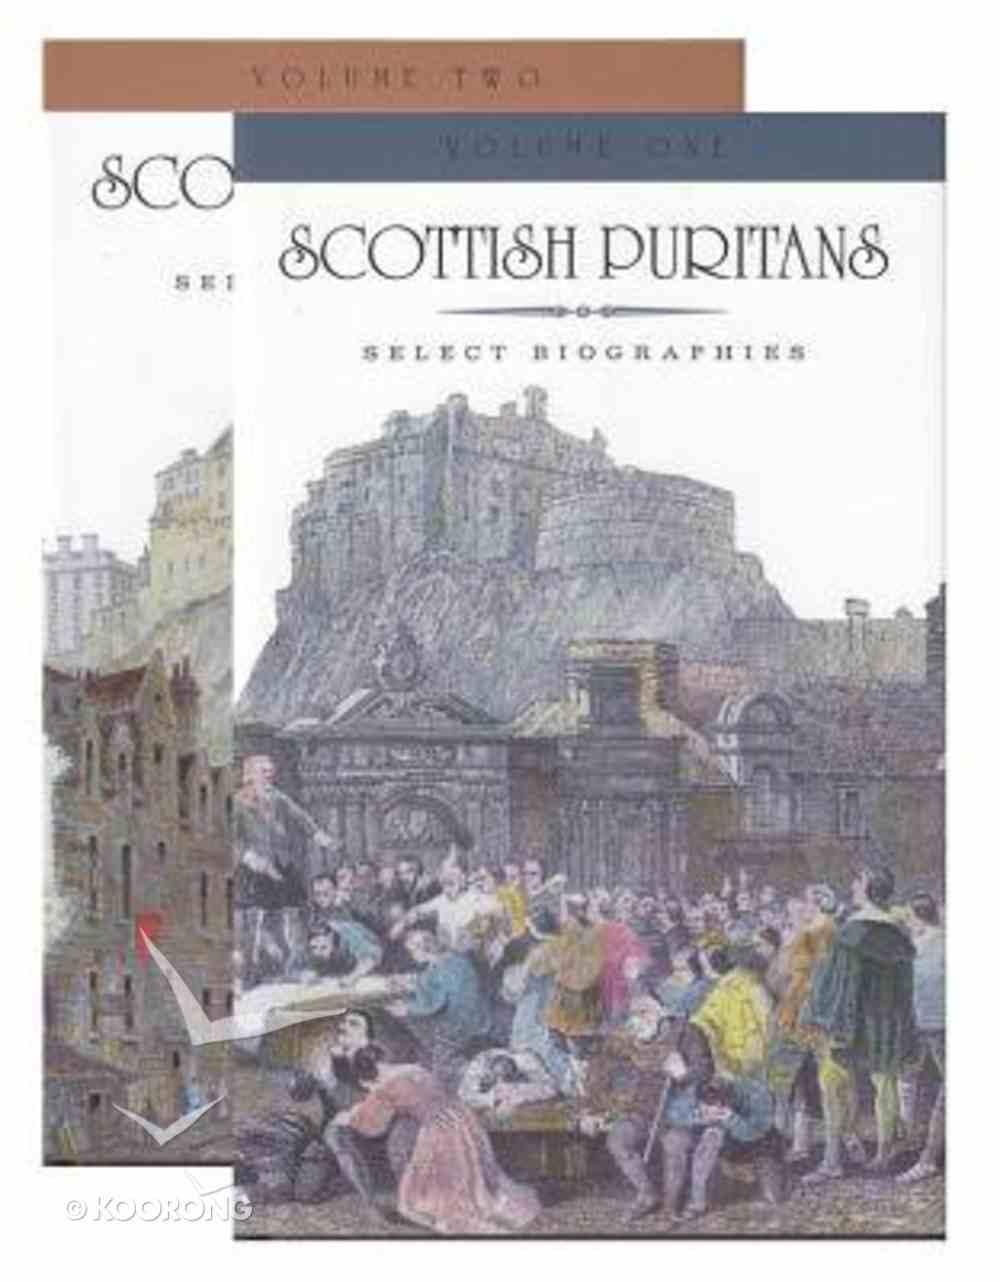 Scottish Puritans - Selected Biographies (2 Vol Set) Hardback